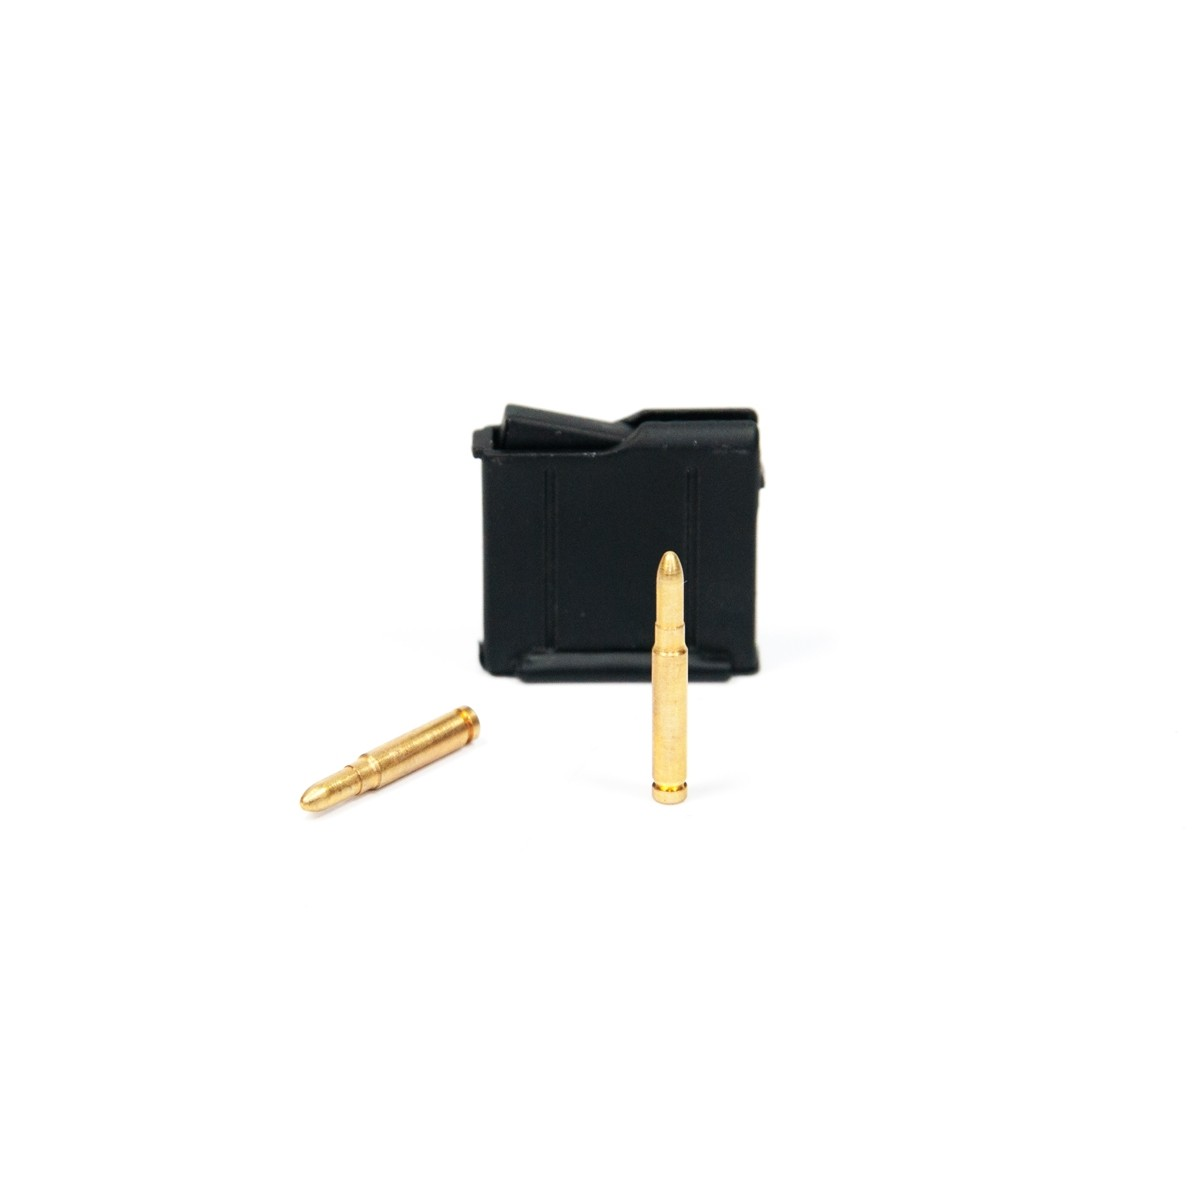 Miniatura Decorativa em Metal modelo L96-CAMO- Arsenal Guns